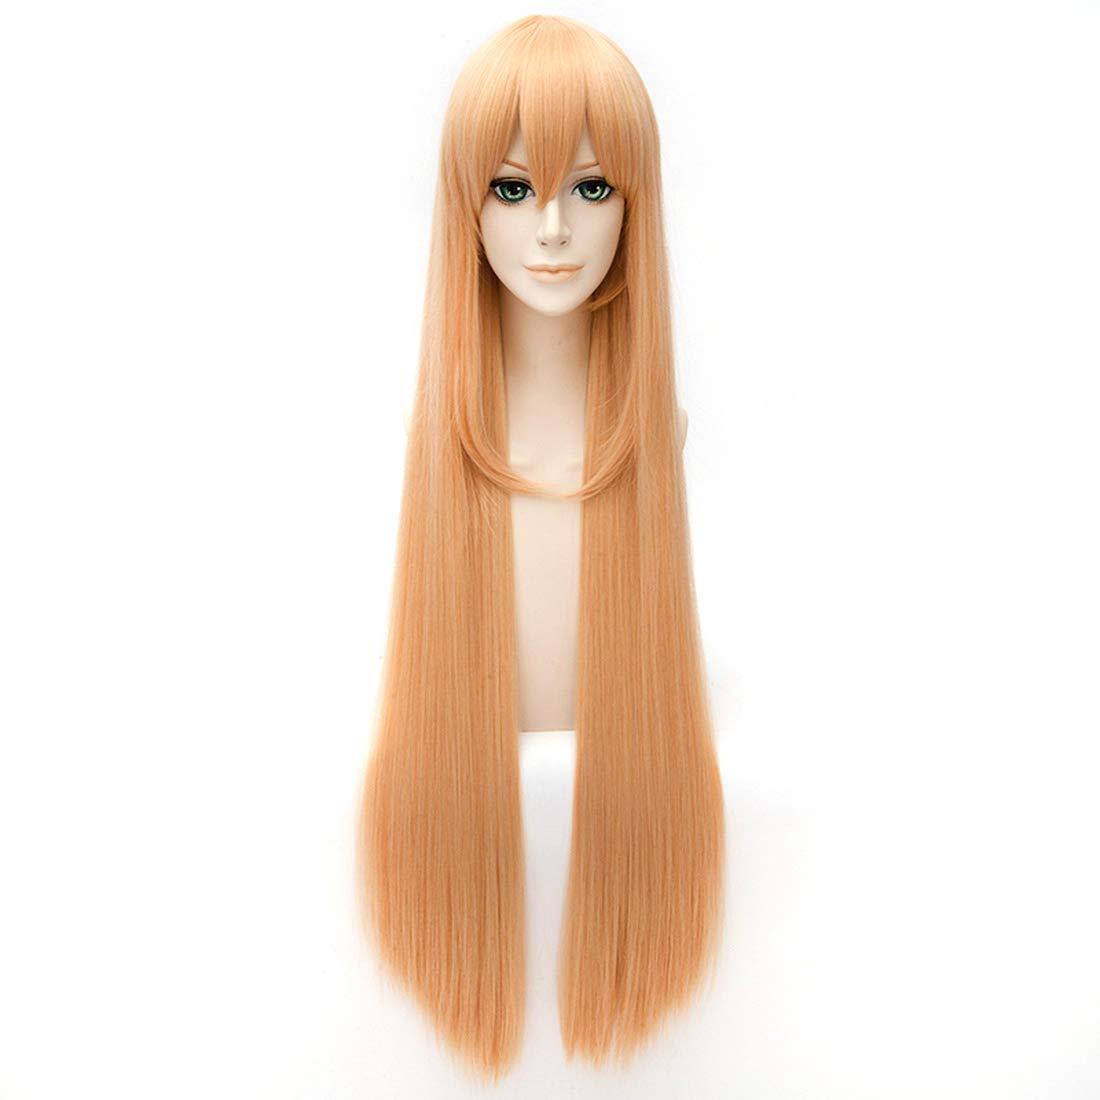 Amazoncom Hoolaza Blonde Long Straight Inward Curly Hair Tailwig